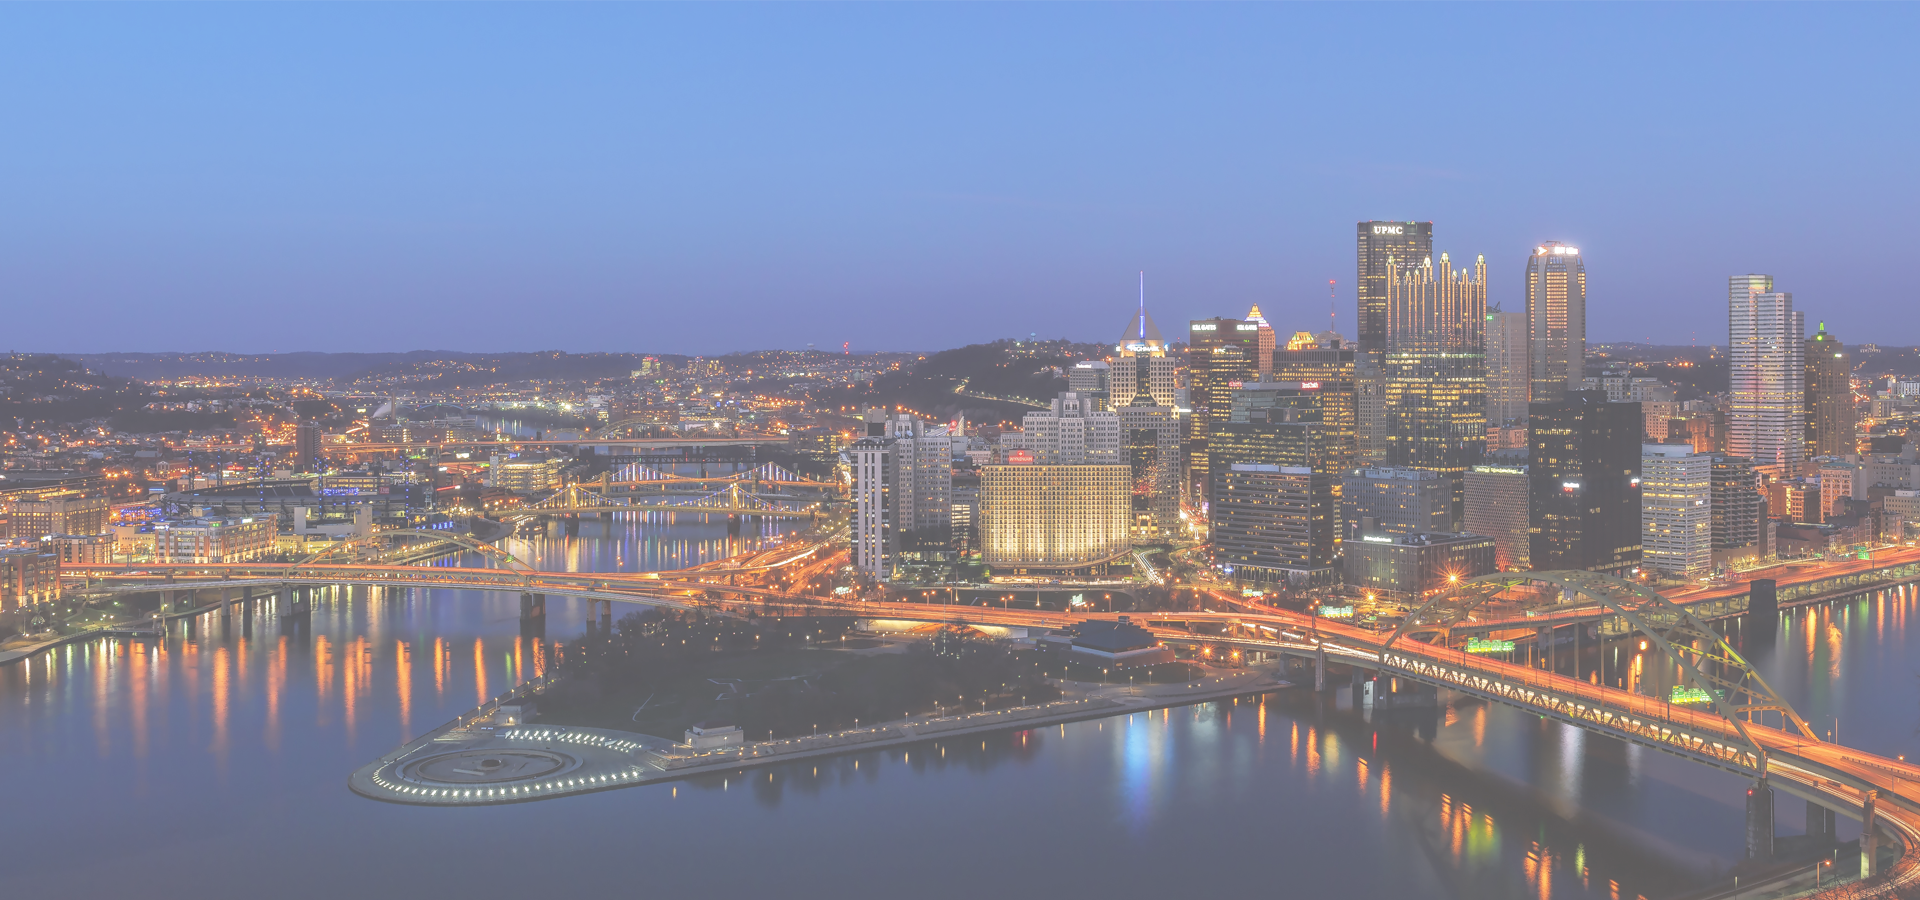 Peer-to-peer advisory in Pittsburgh, Pennsylvania, USA